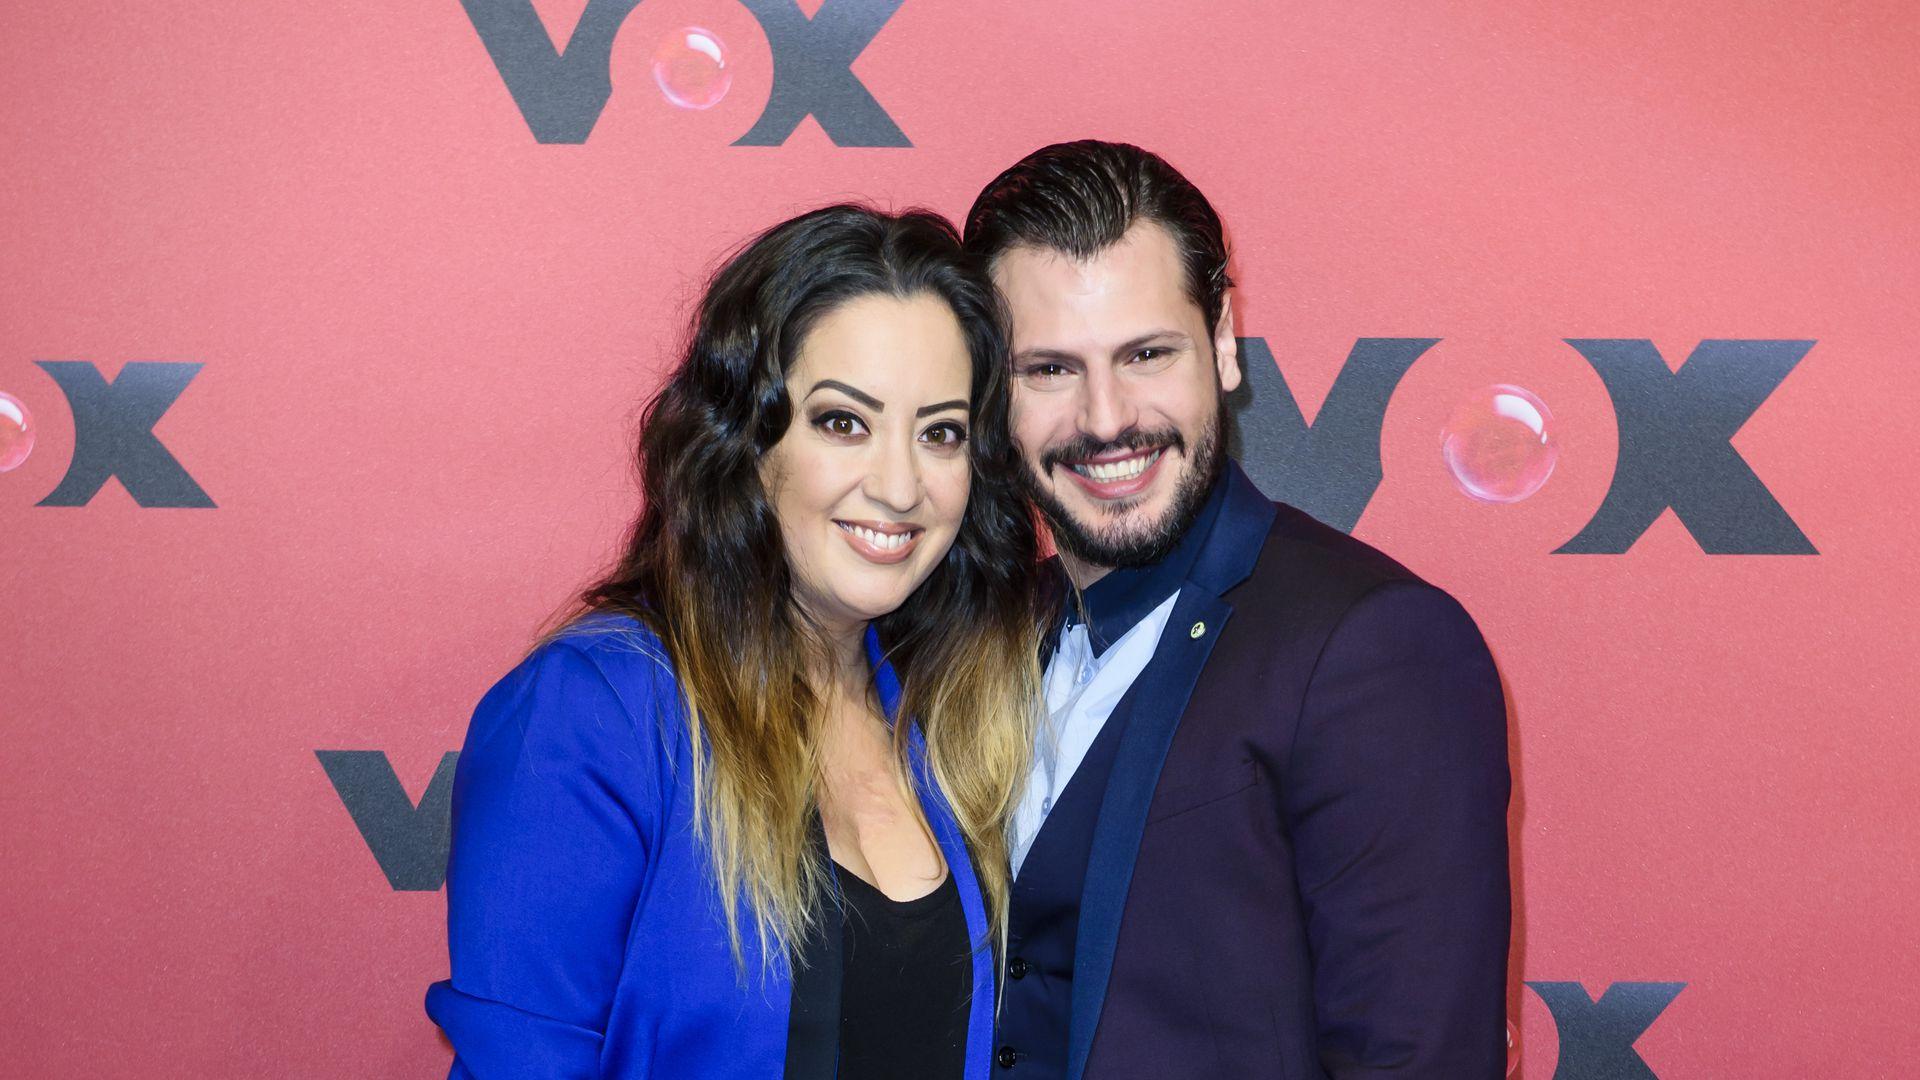 Manuel Cortez & Freundin: Verliebt wie am 1. Tag